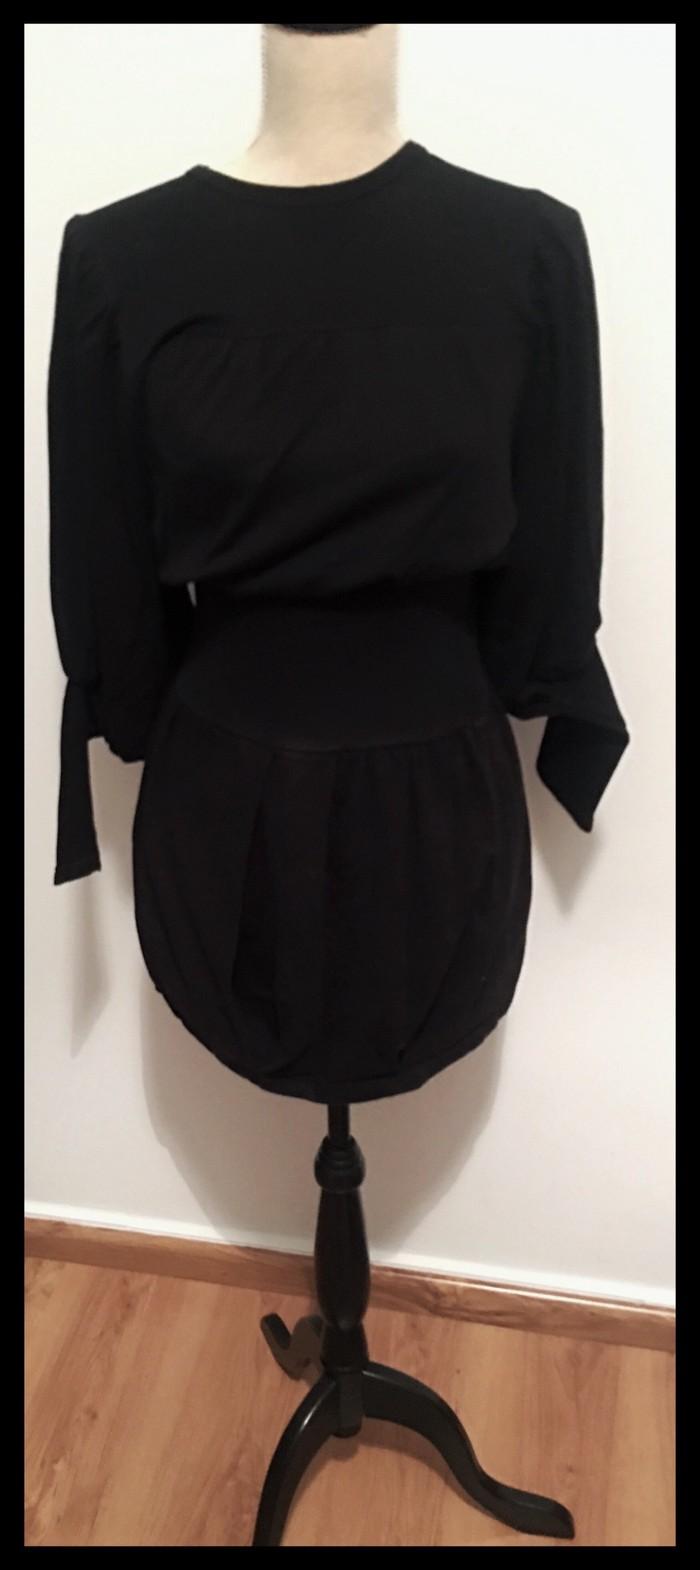 Lak by Gavalas φορεμα κοντο μαυρο (small-medium)